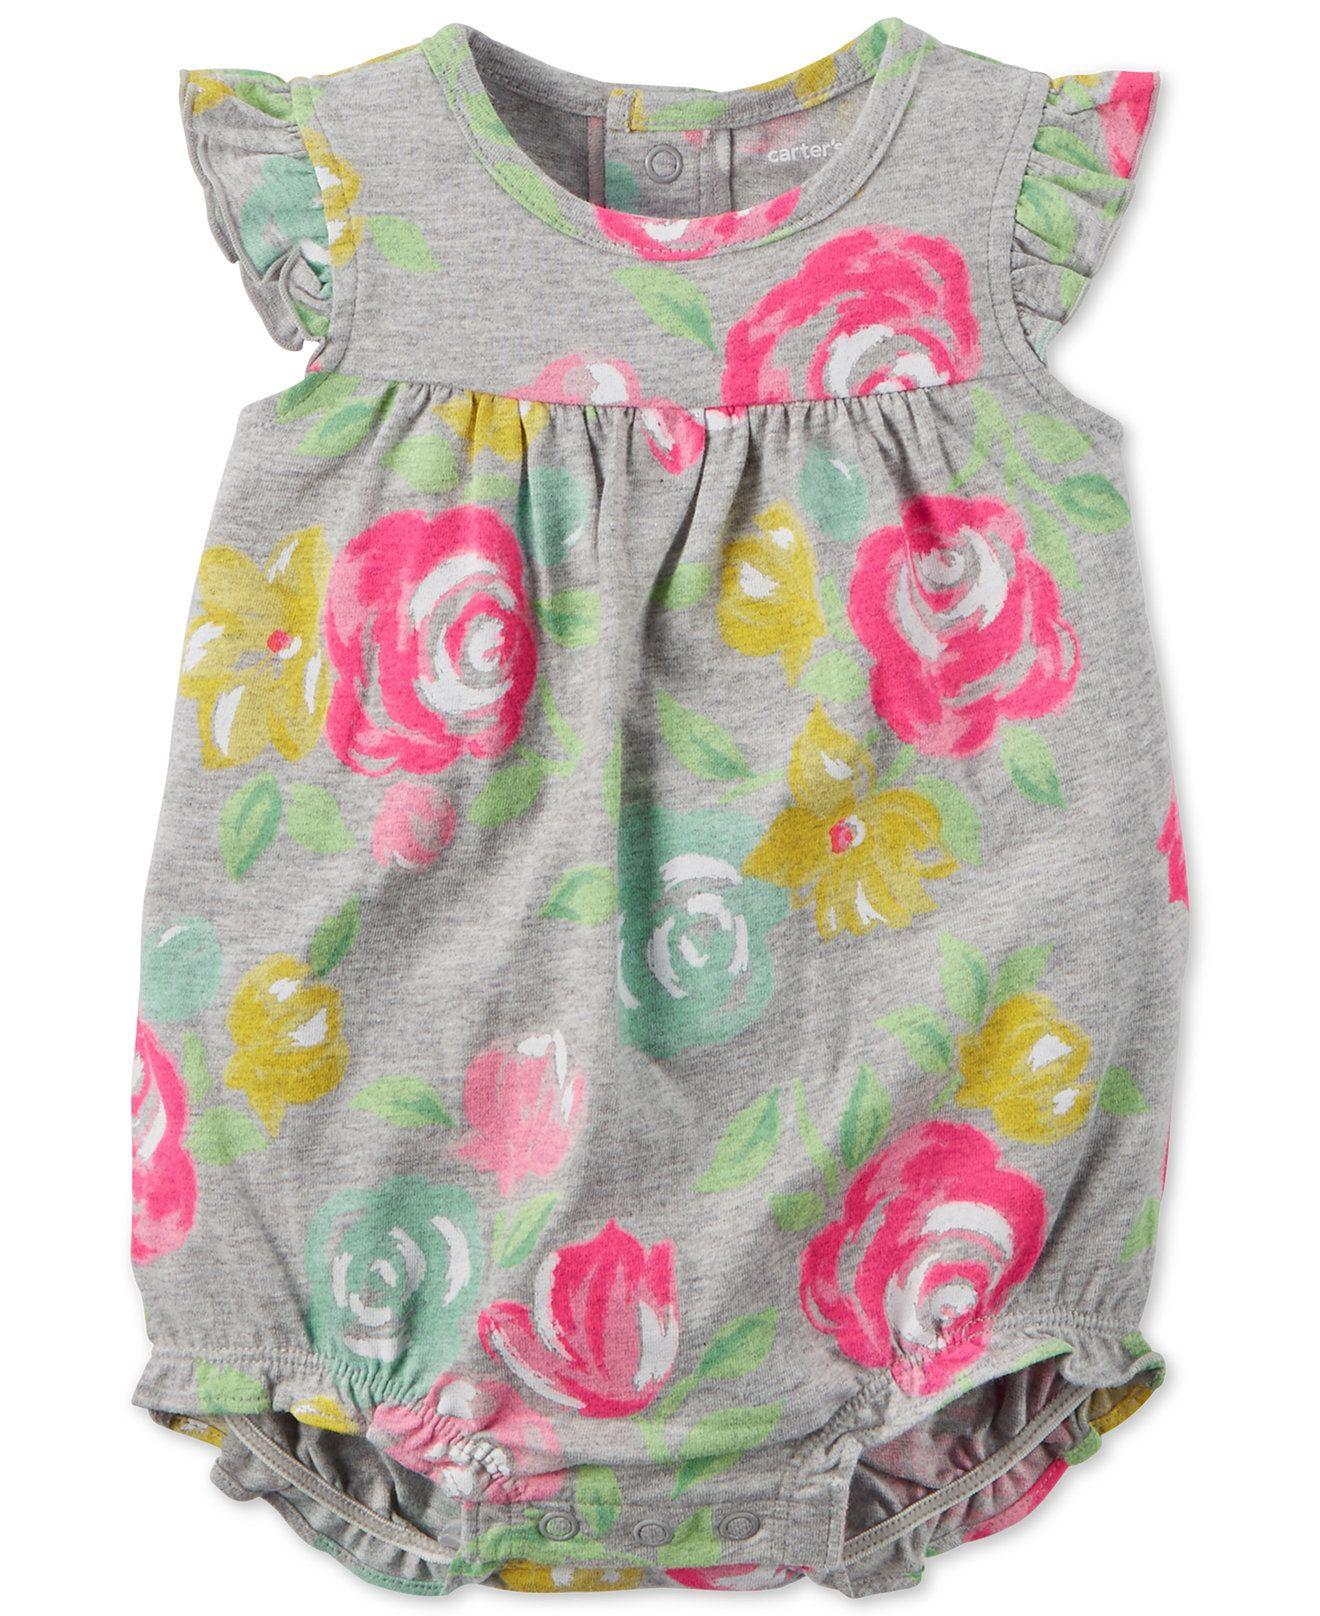 8441bb26b6f7 Carter s Baby Girls  Floral-Print Romper - Baby Girl (0-24 months) - Kids    Baby - Macy s